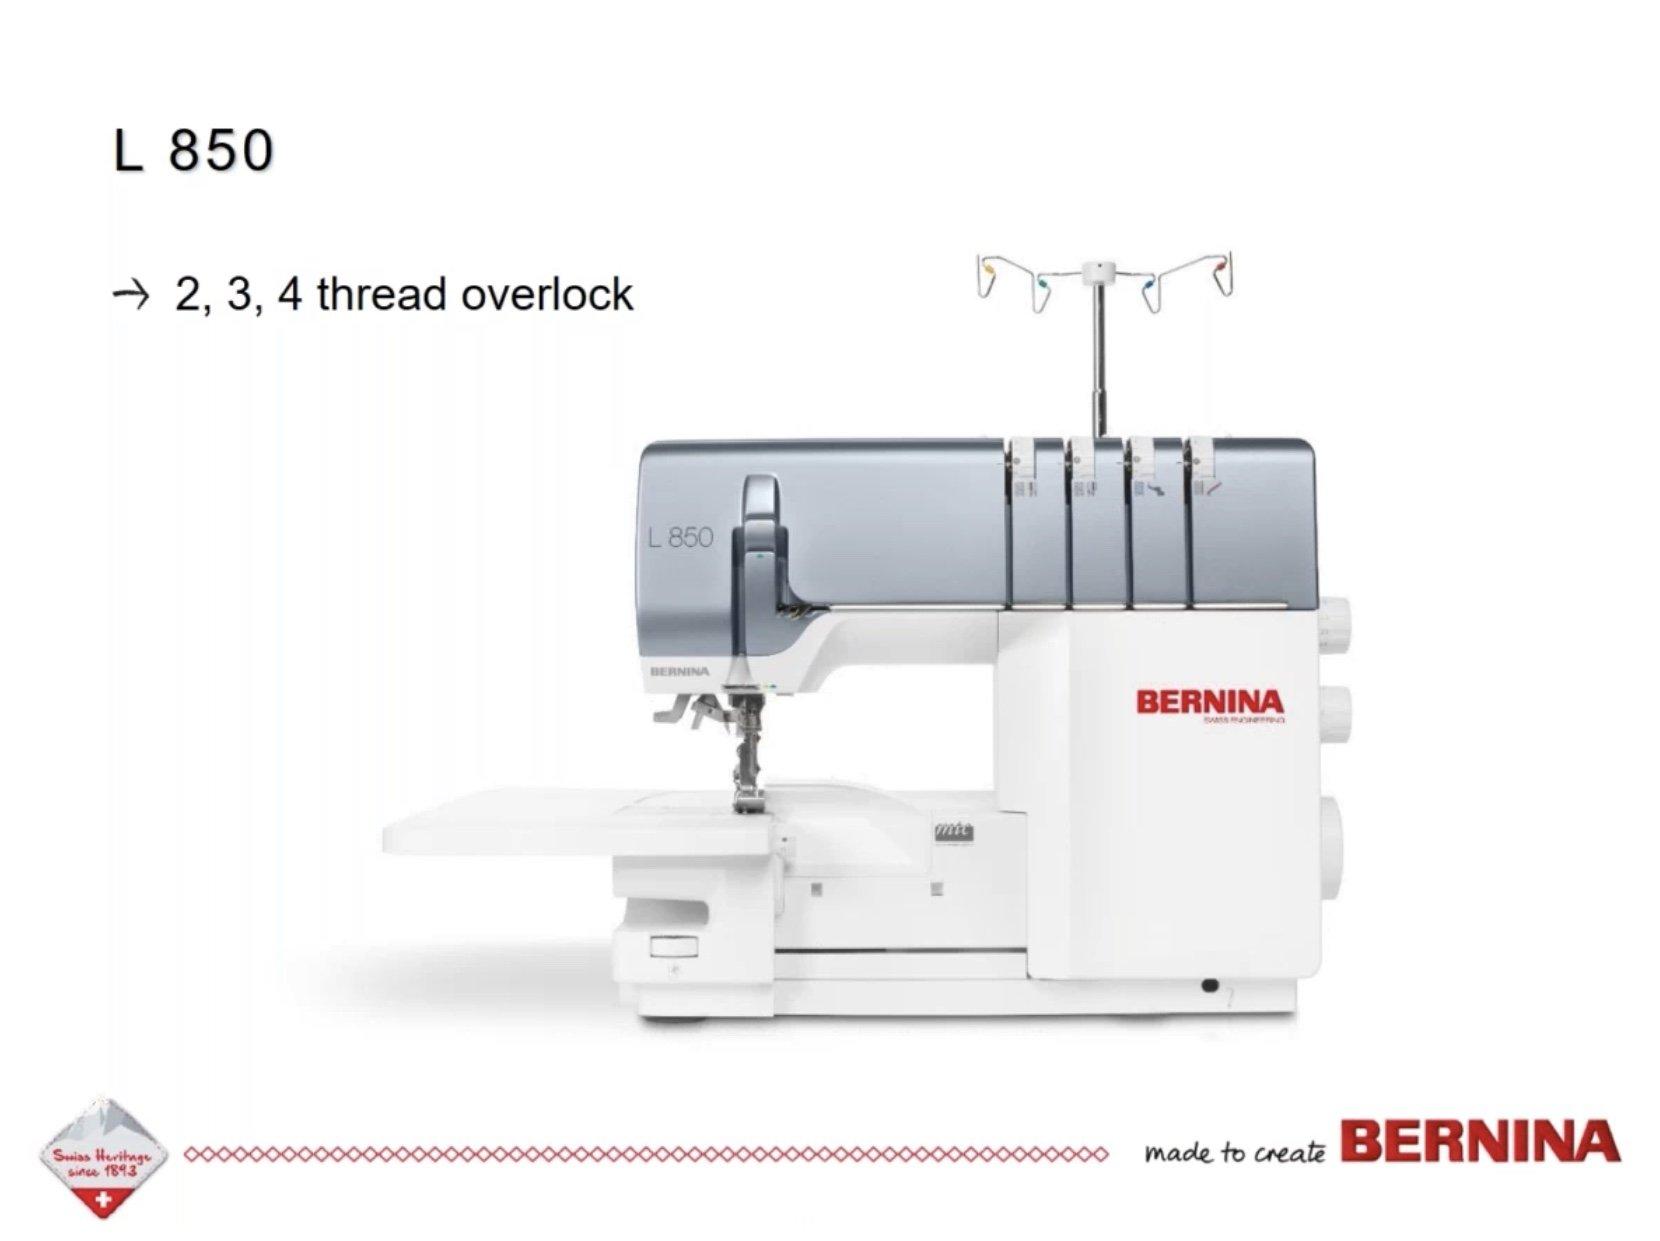 Bernina L 850 Air Thread Serger Overlocker